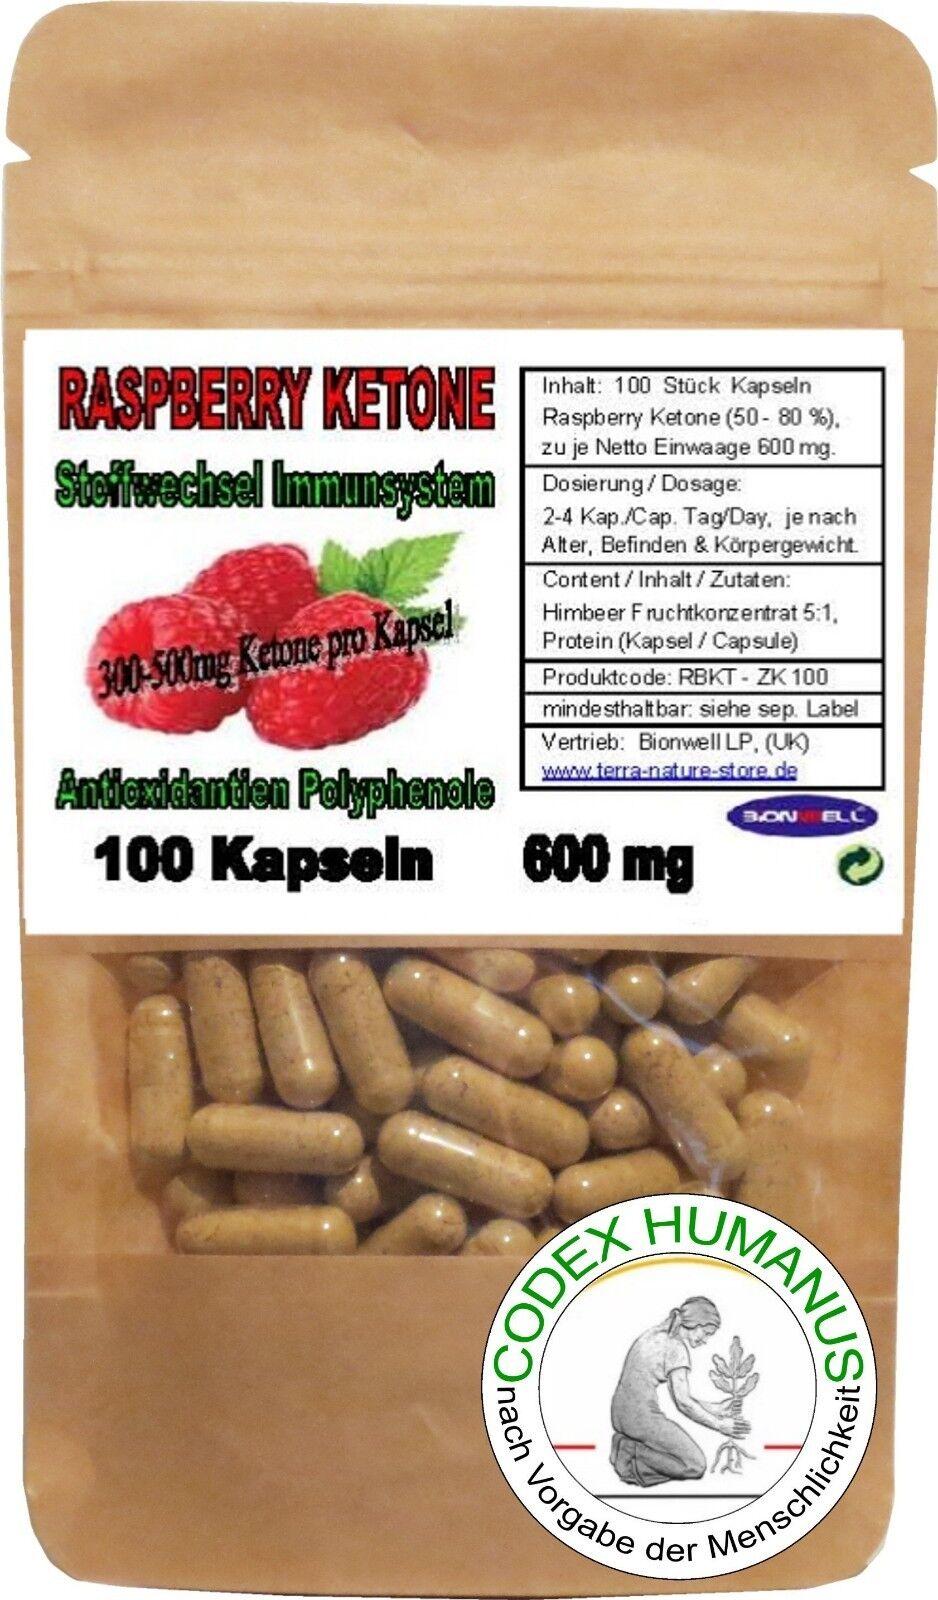 100 Kapseln 600 mg Raspberry Ketone. Himbeerketon. STOFFWECHSEL  IMMUNSYSTEM